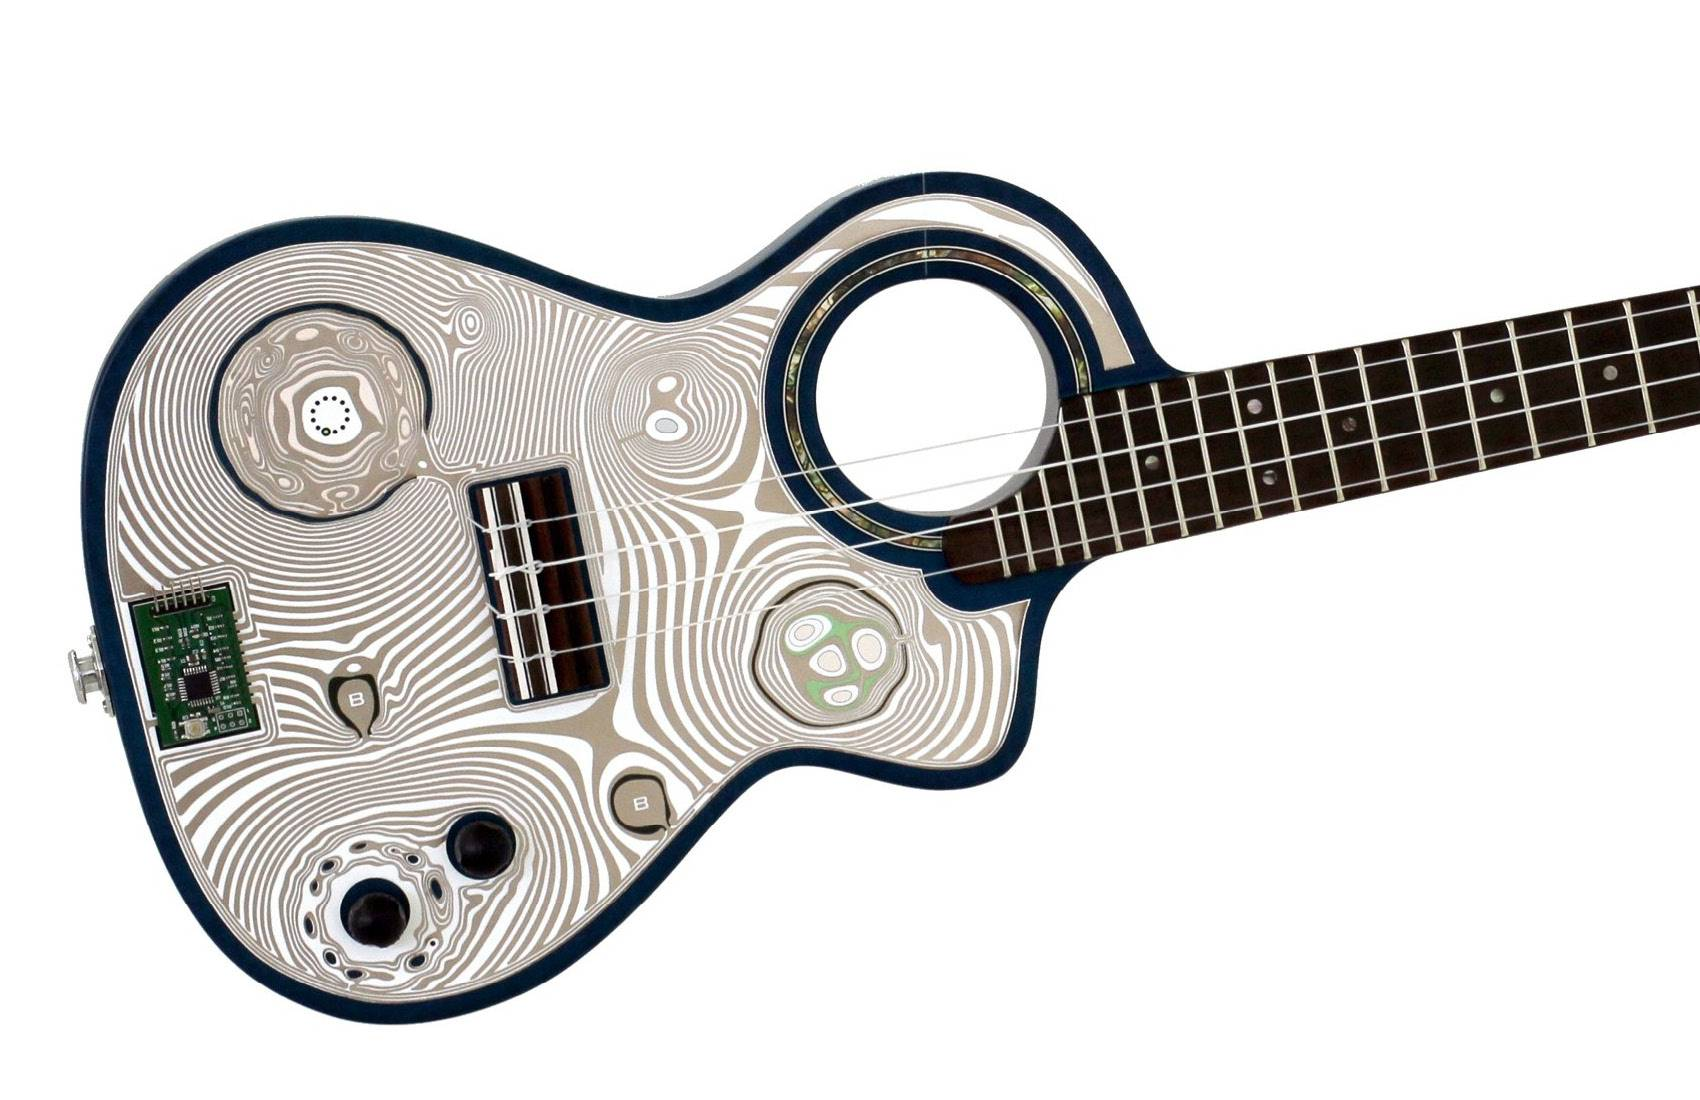 Digital Fabrication & Music